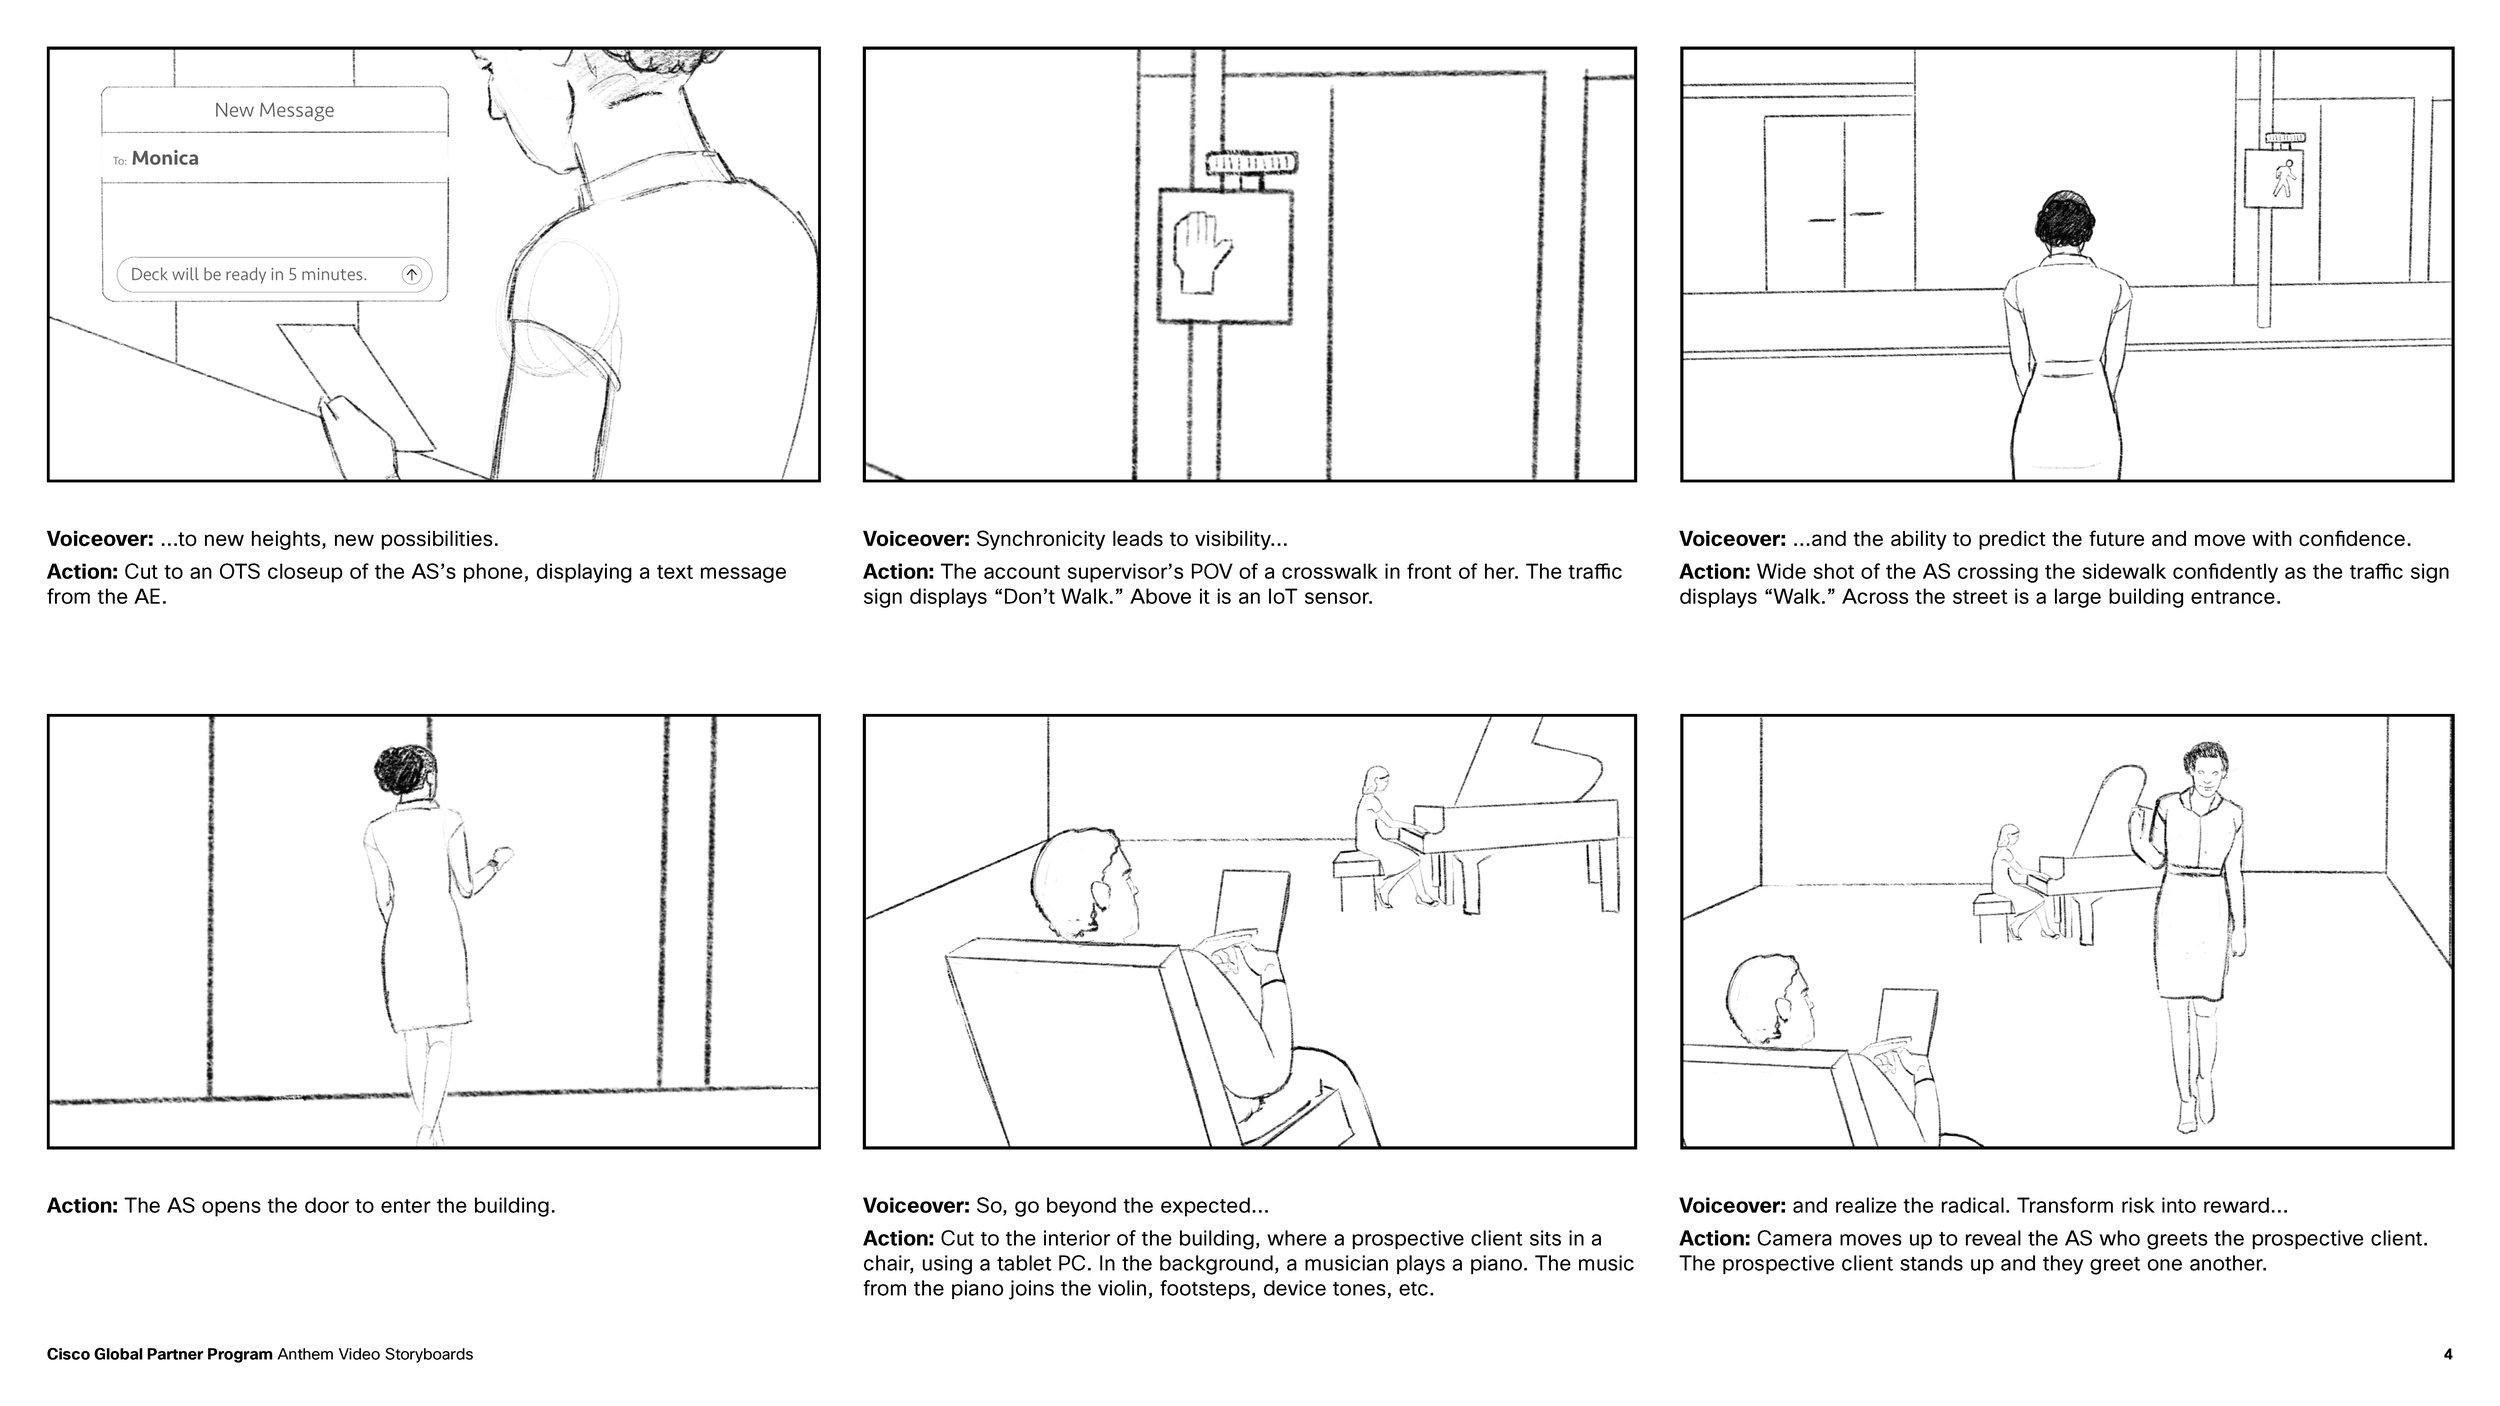 cisco-boundless-anthem-video-storyboards_r1_v2_Page_4.jpg